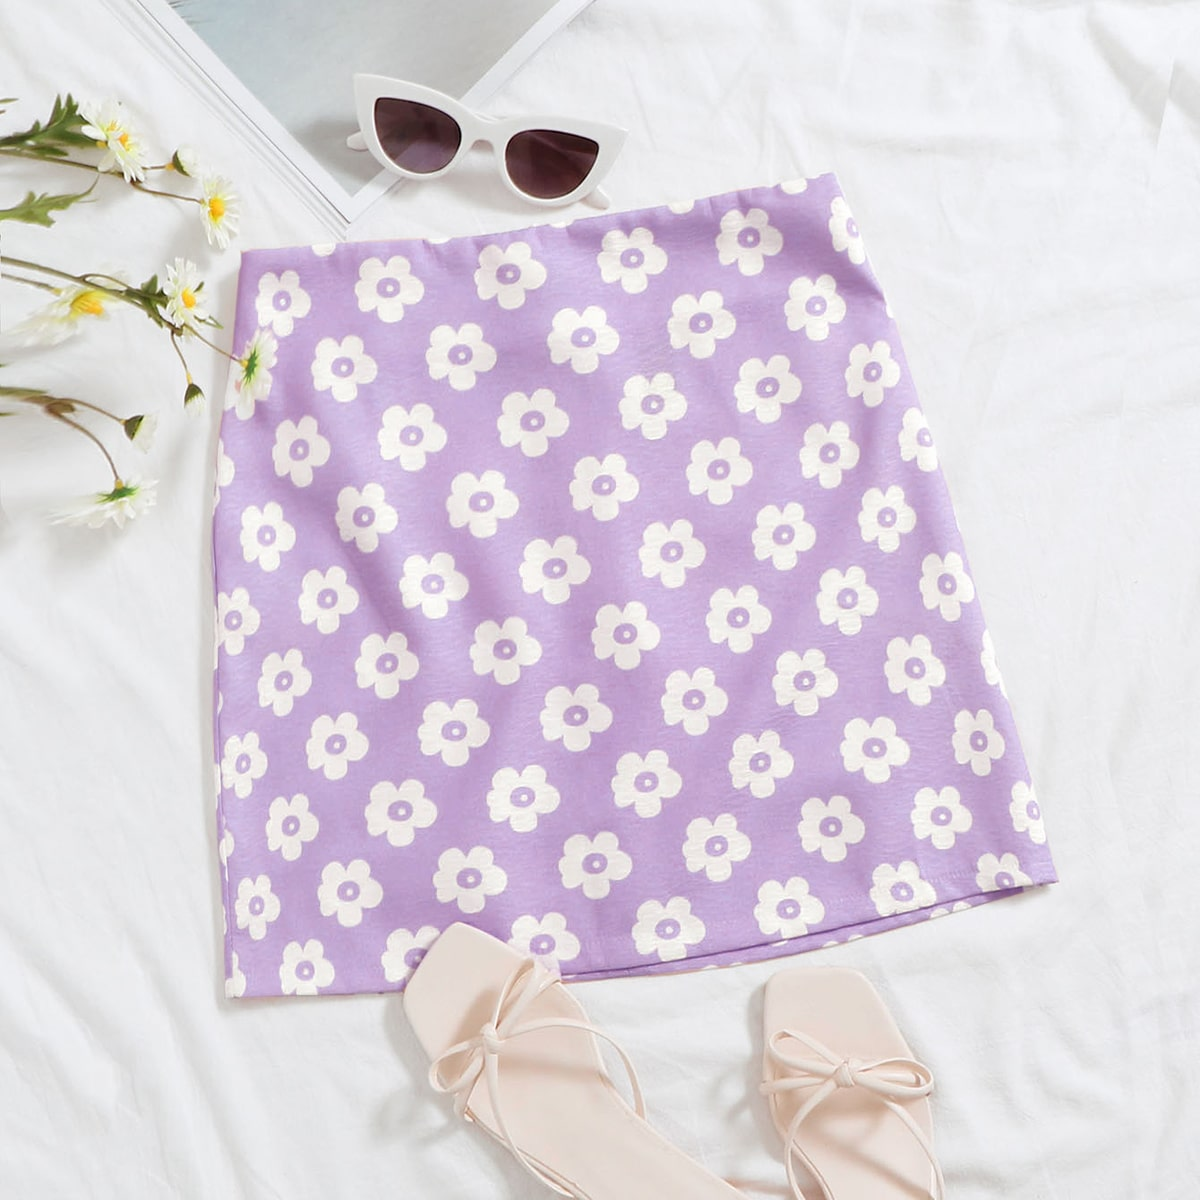 Цветочная юбка с молнией сзади